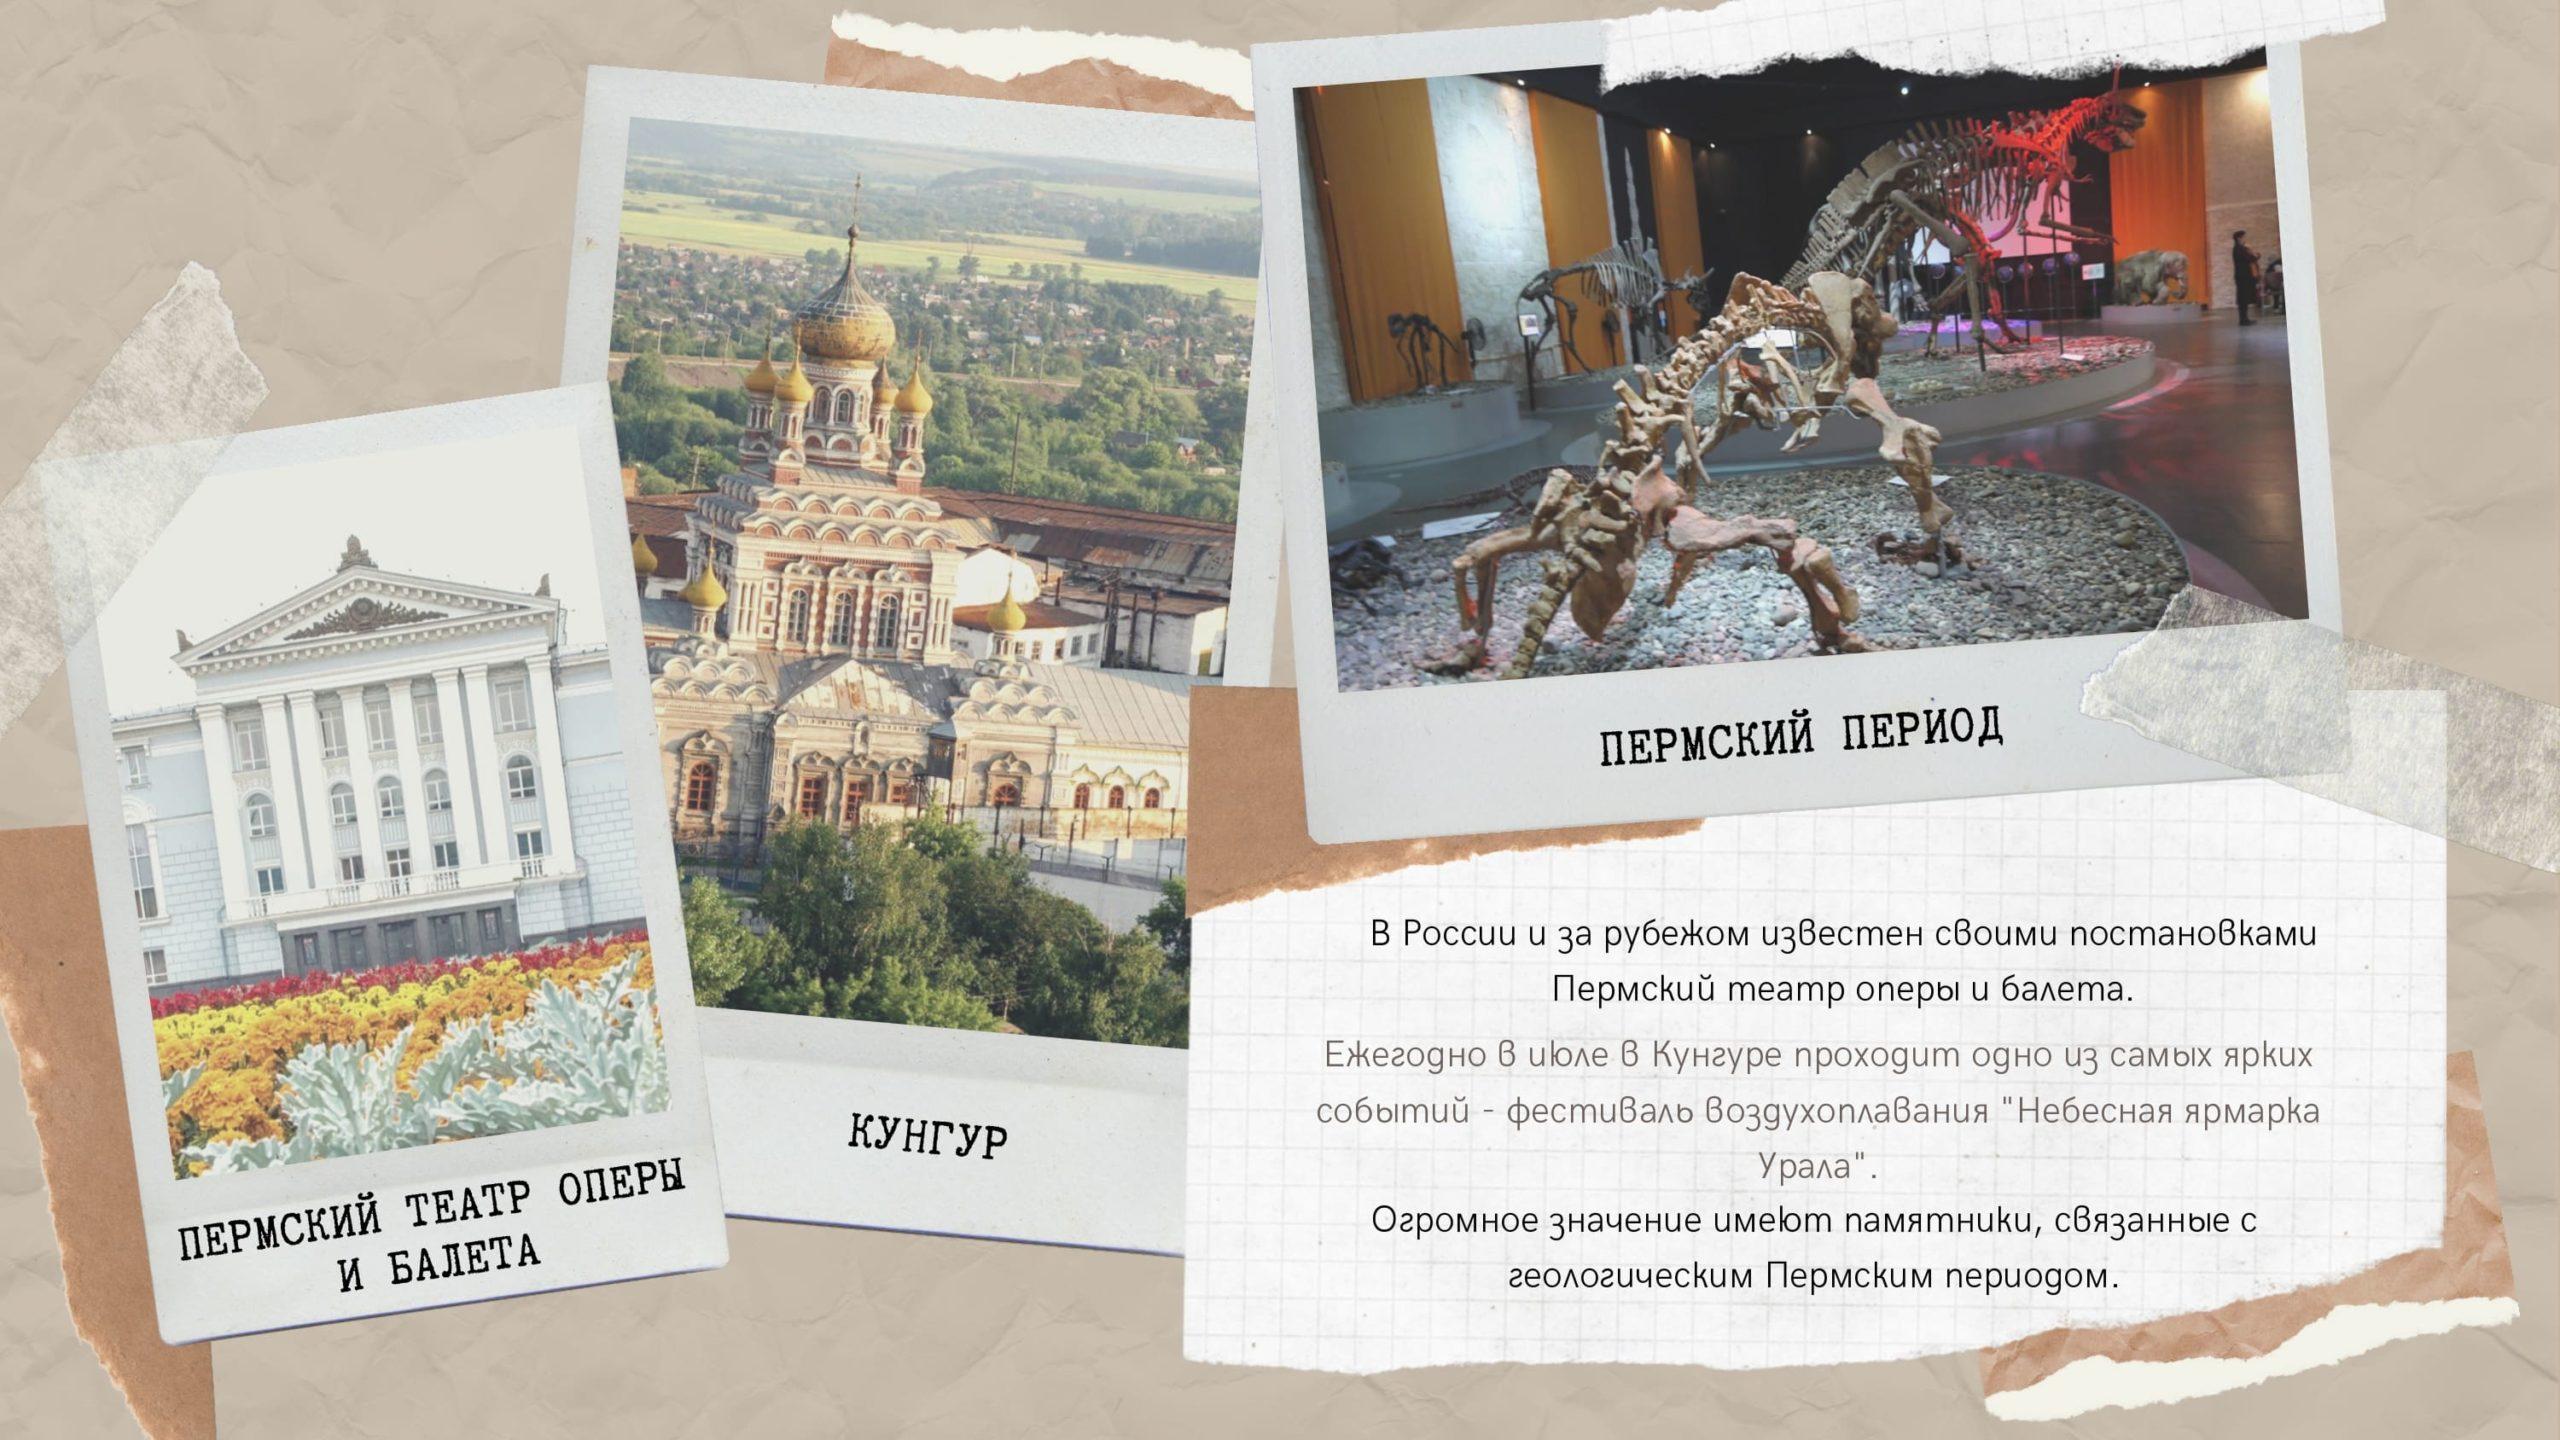 Пермский театр оперы и балета. Кунгур. Пермский период